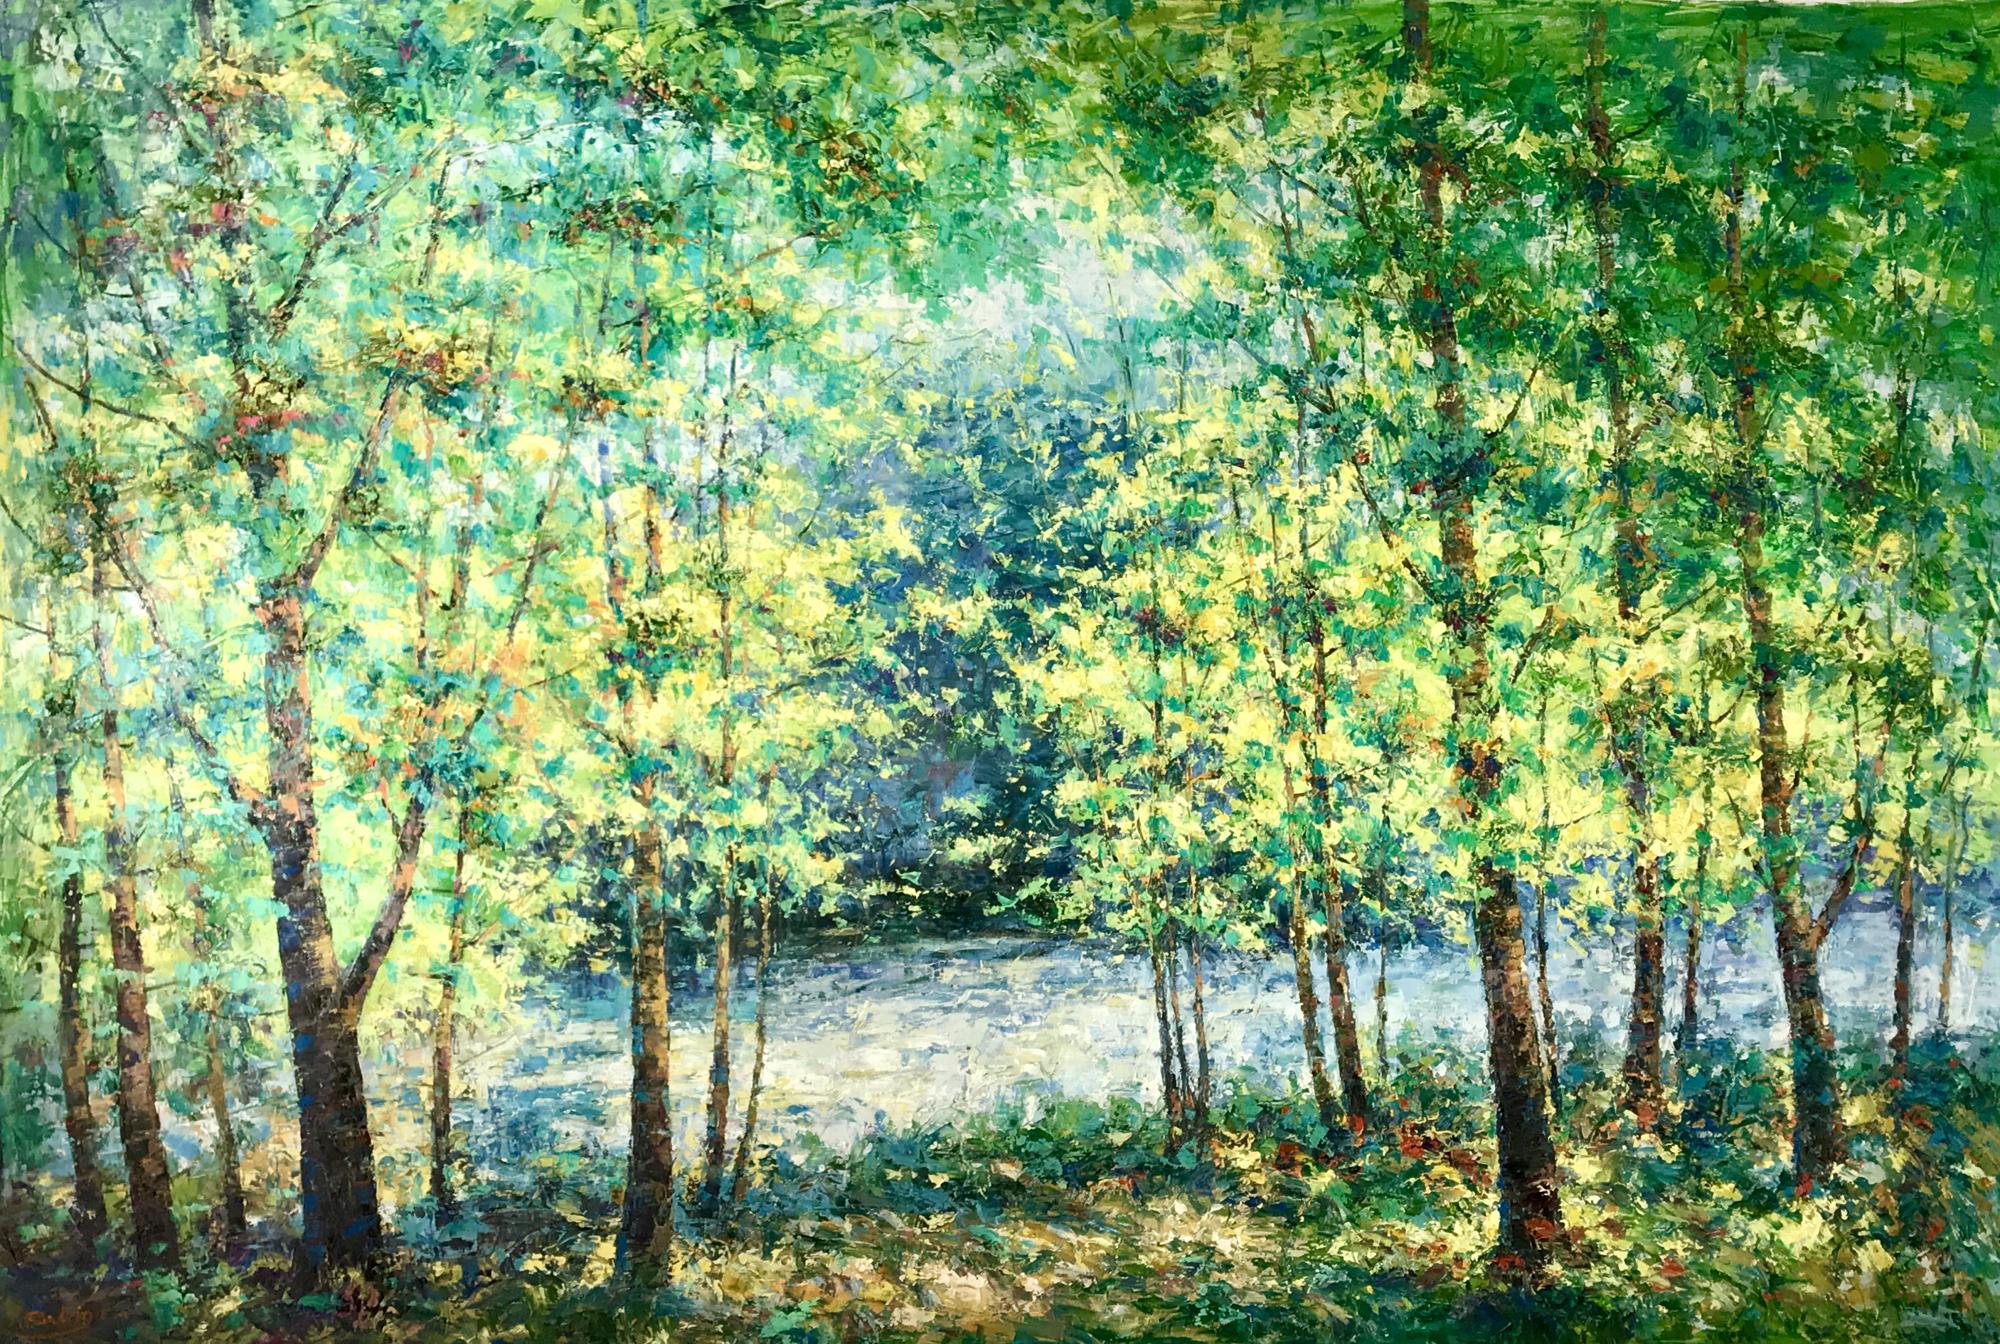 TREES BY THE RIVER by RODRIGO